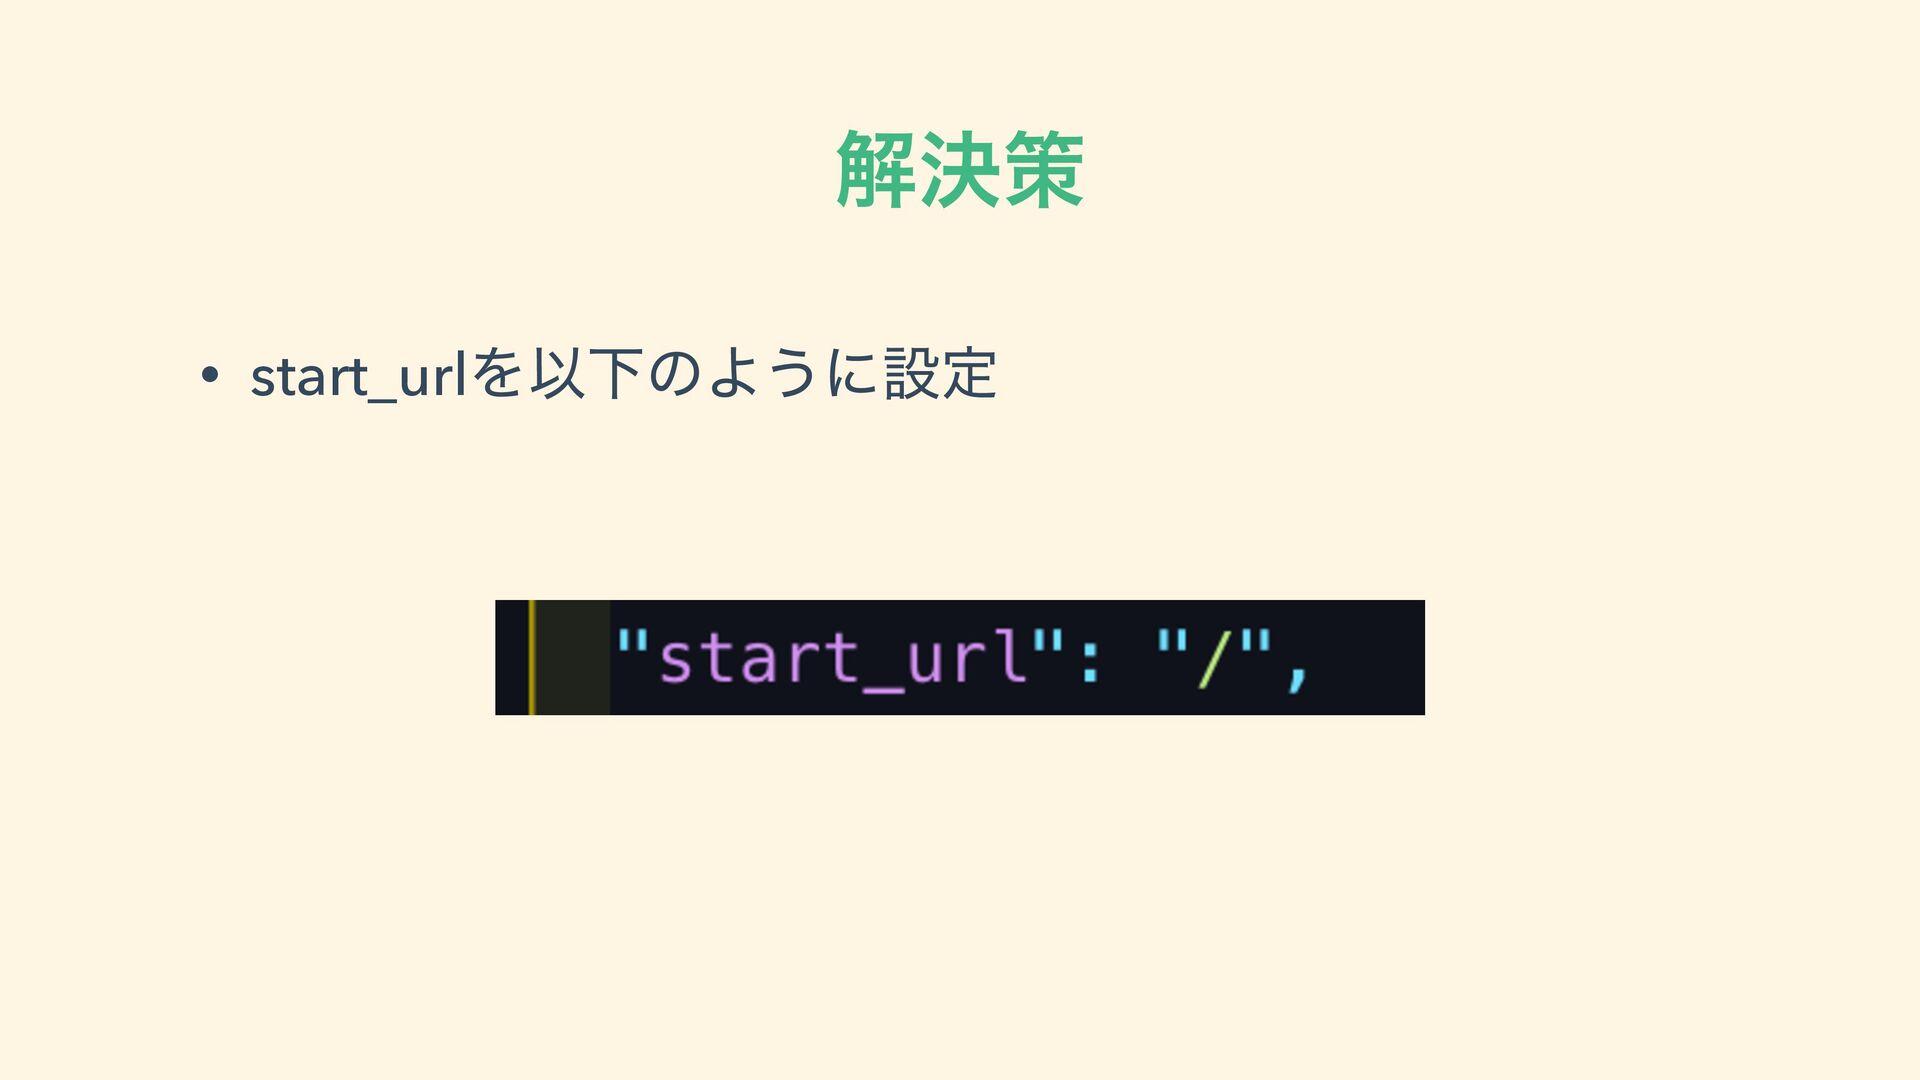 ղܾࡦ • start_urlΛҎԼͷΑ͏ʹઃఆ